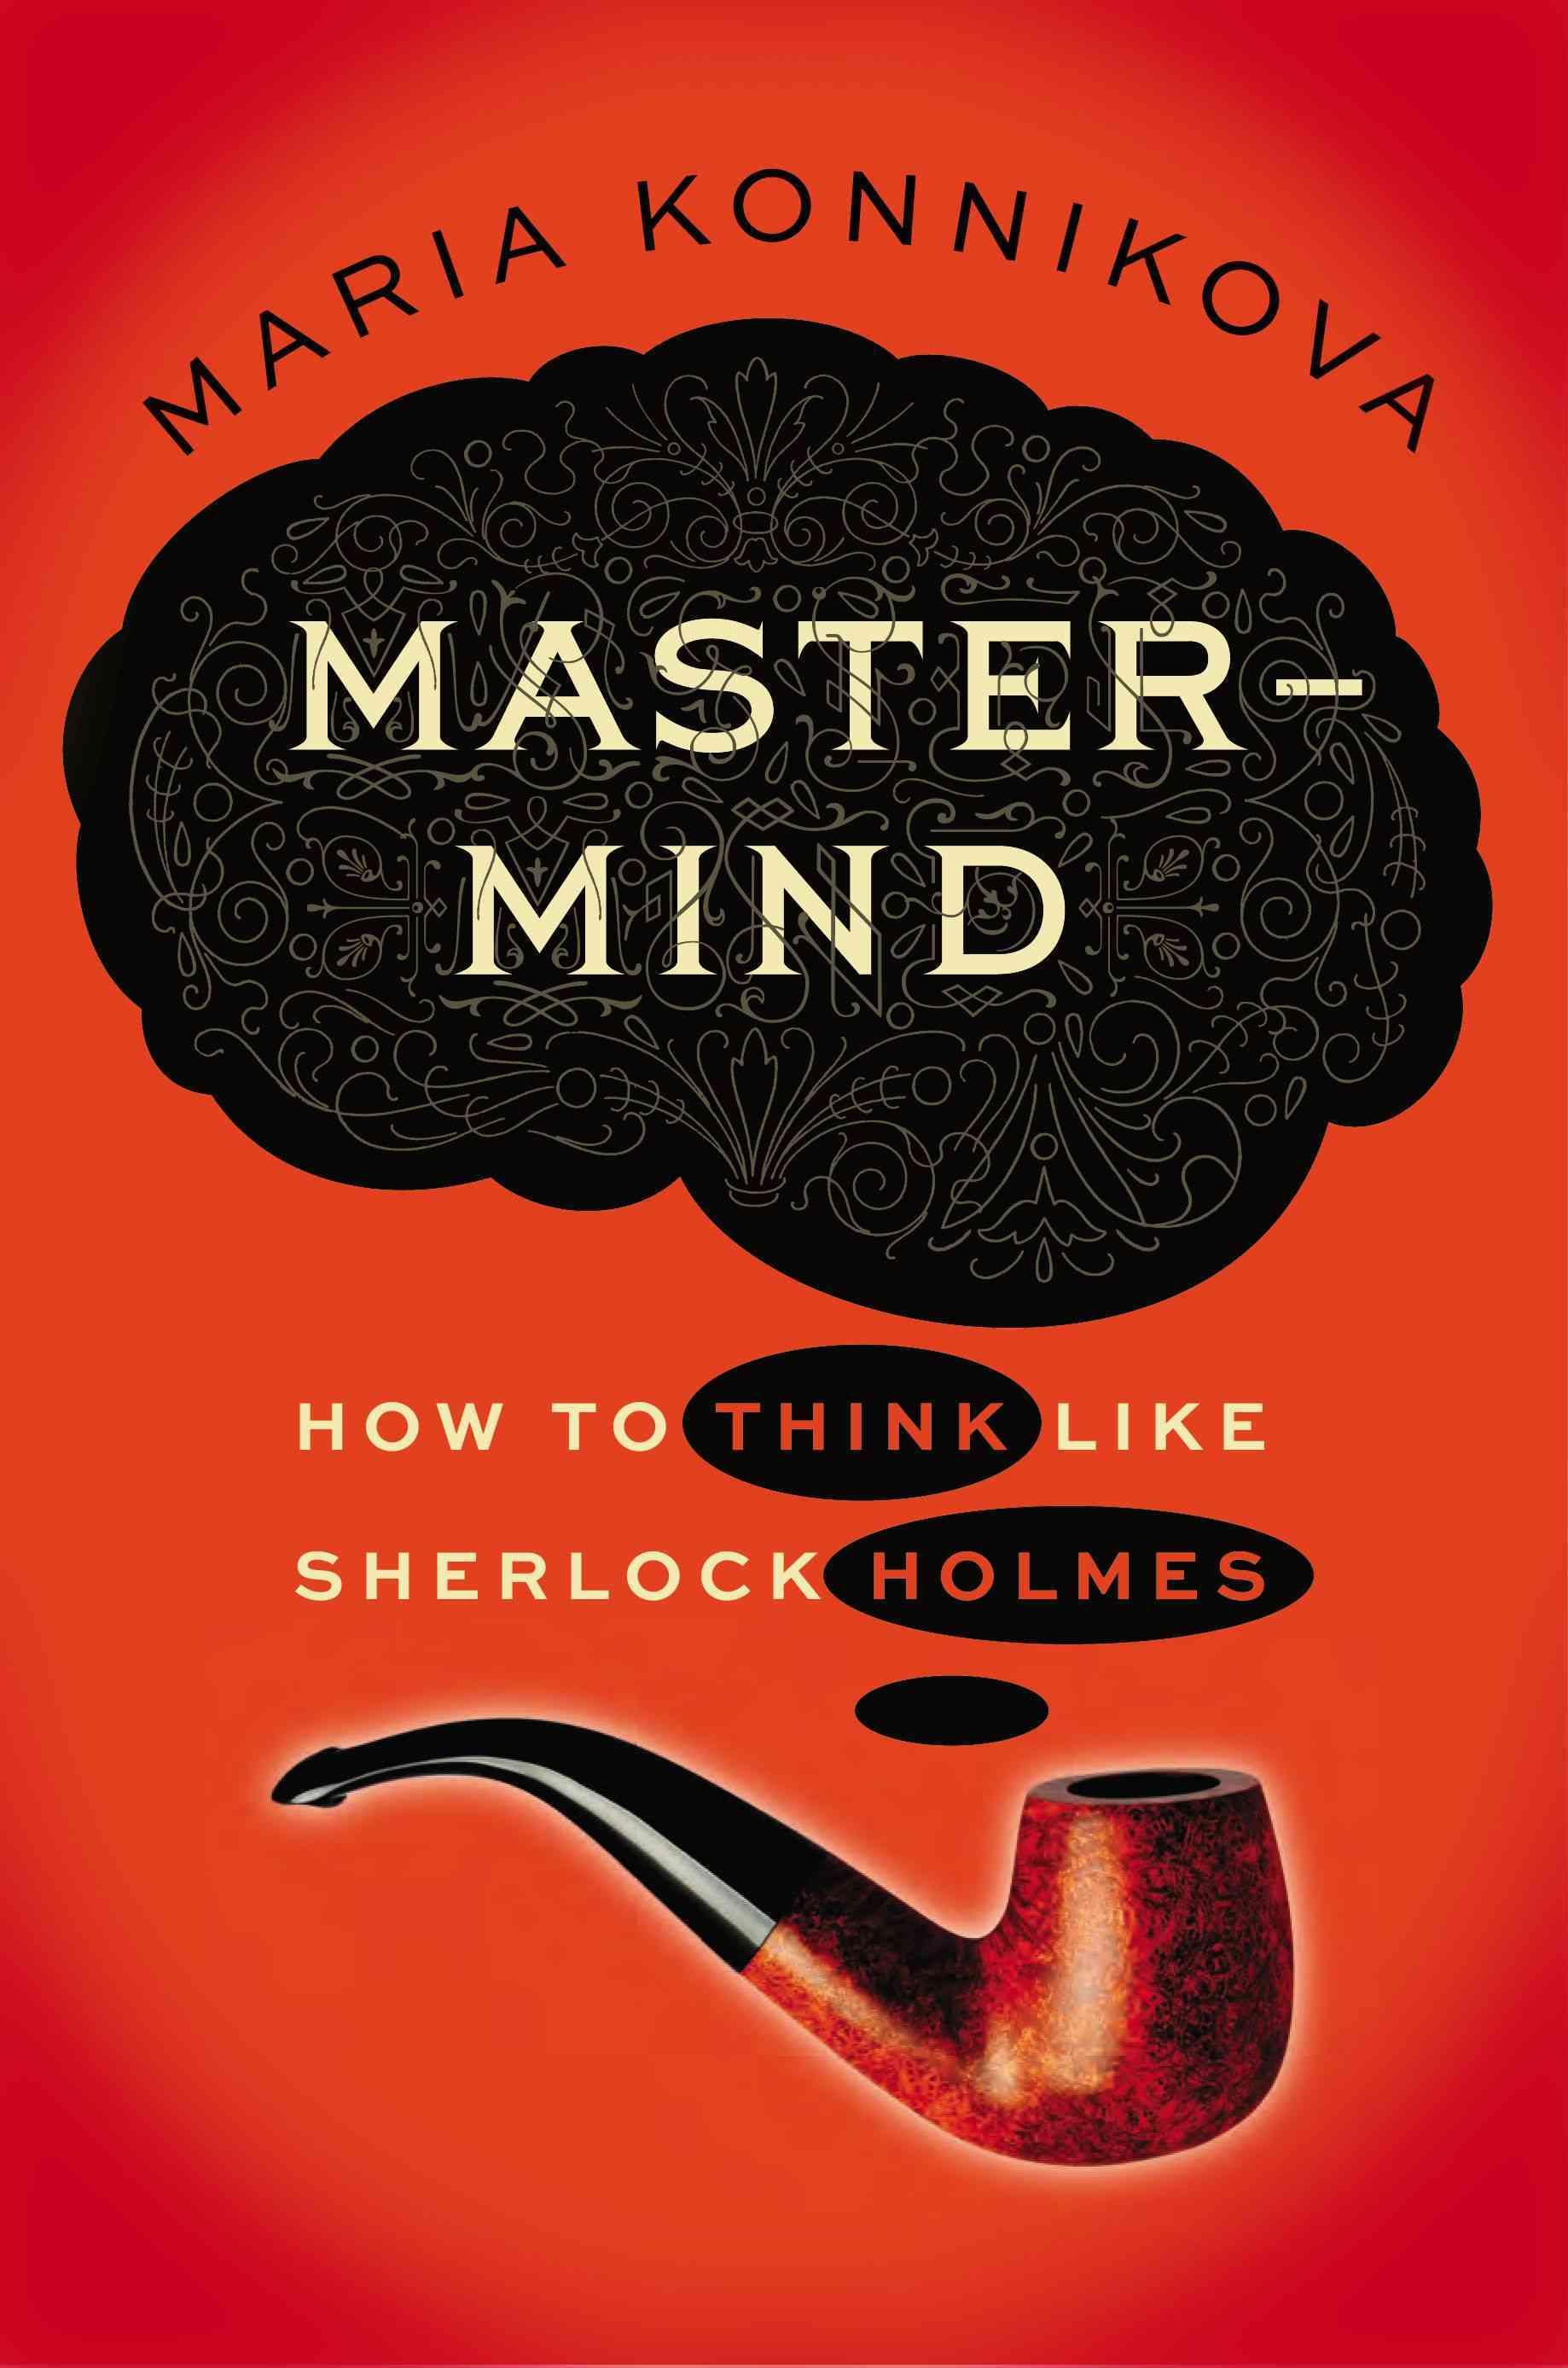 Mastermind: How to Think Like Sherlock Holmes (Hardcover)